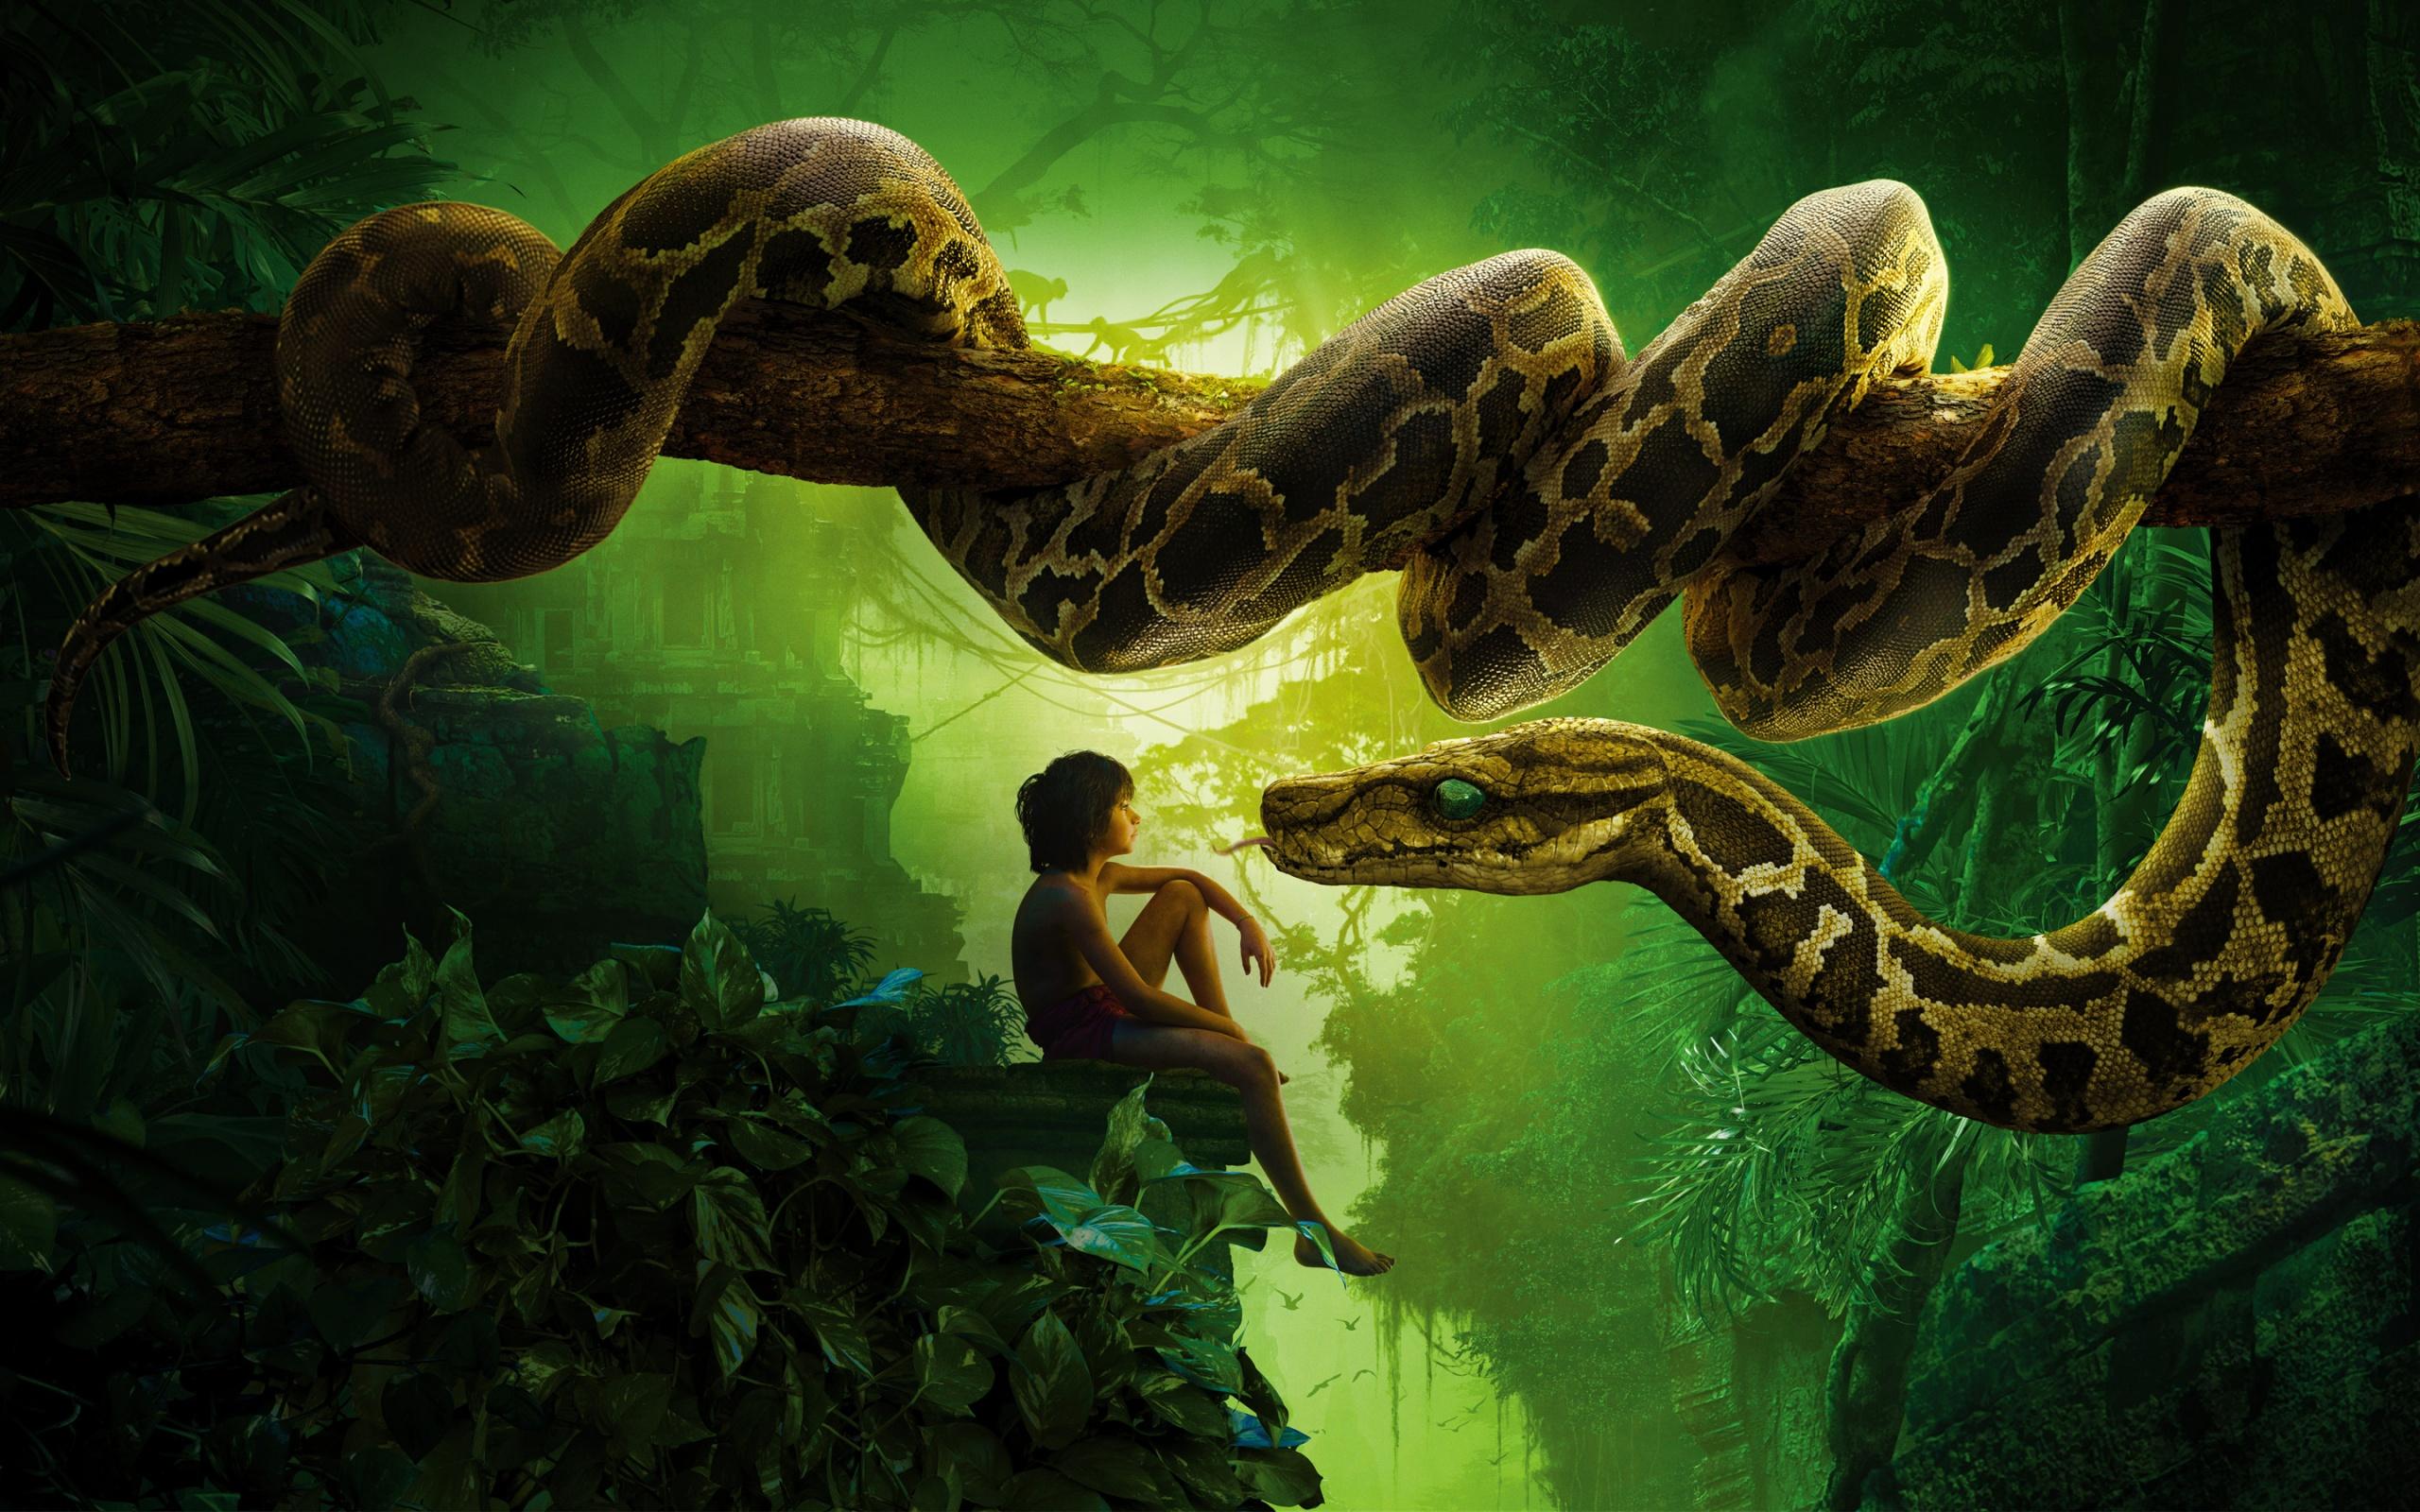 Jungle Book Snake Kaa Mowgli Wallpapers HD Wallpapers 2560x1600